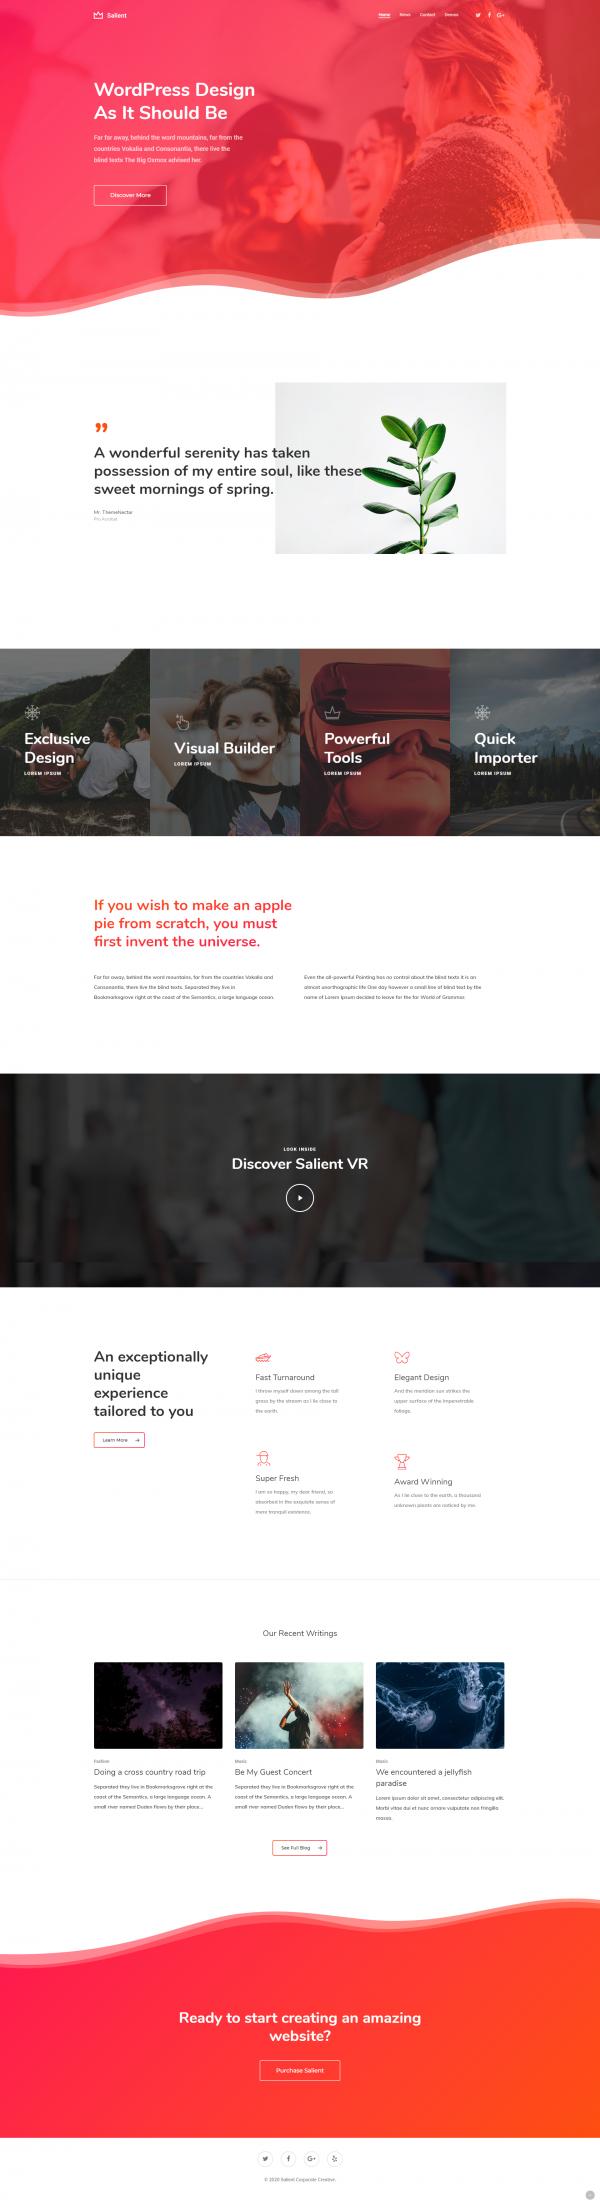 Création site internet vitrine corporate creative